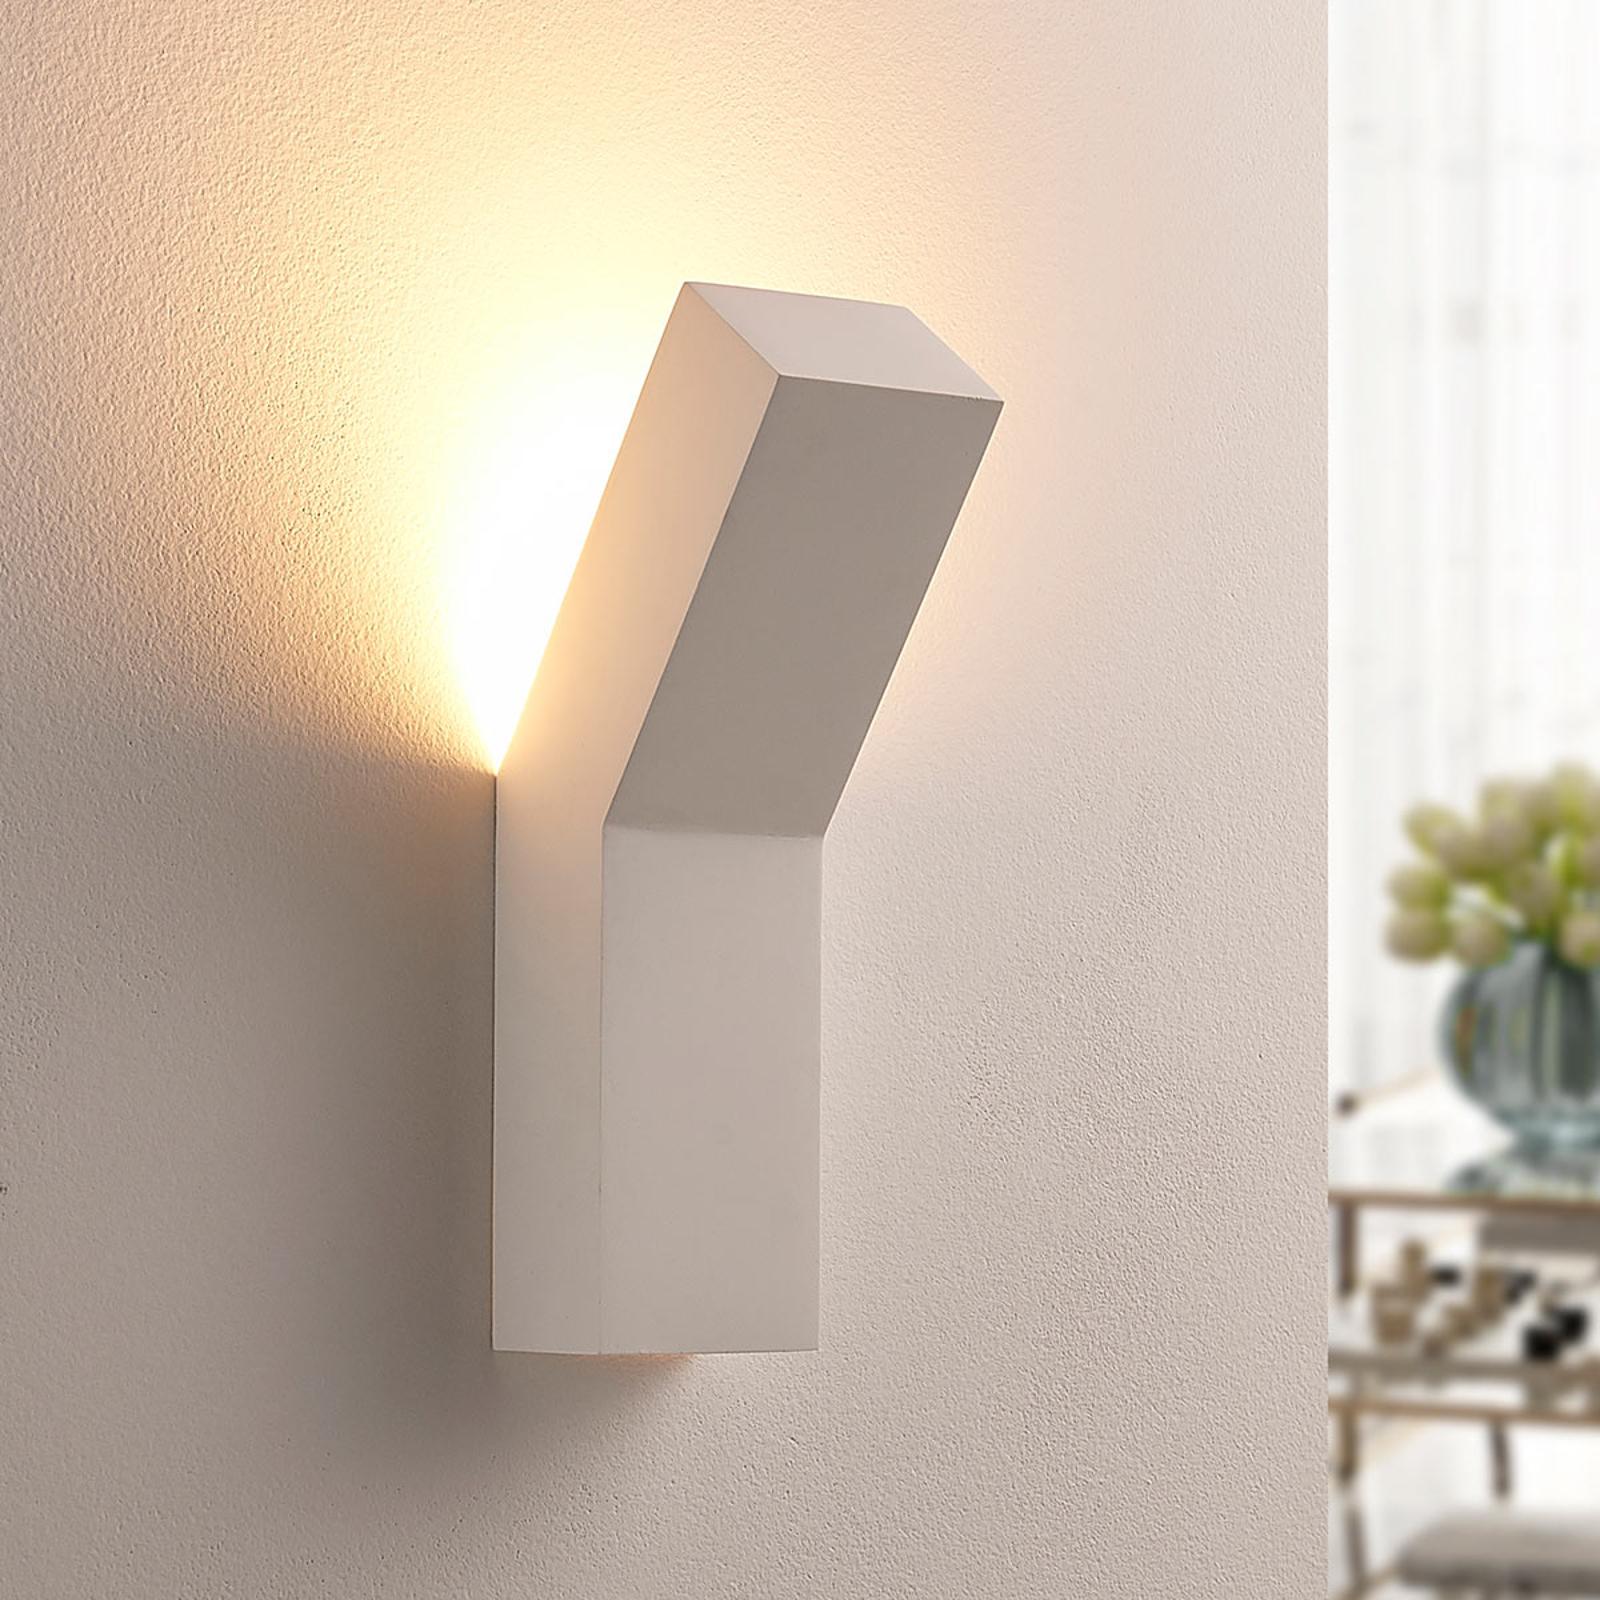 Moderno wallwasher LED Tida di gesso